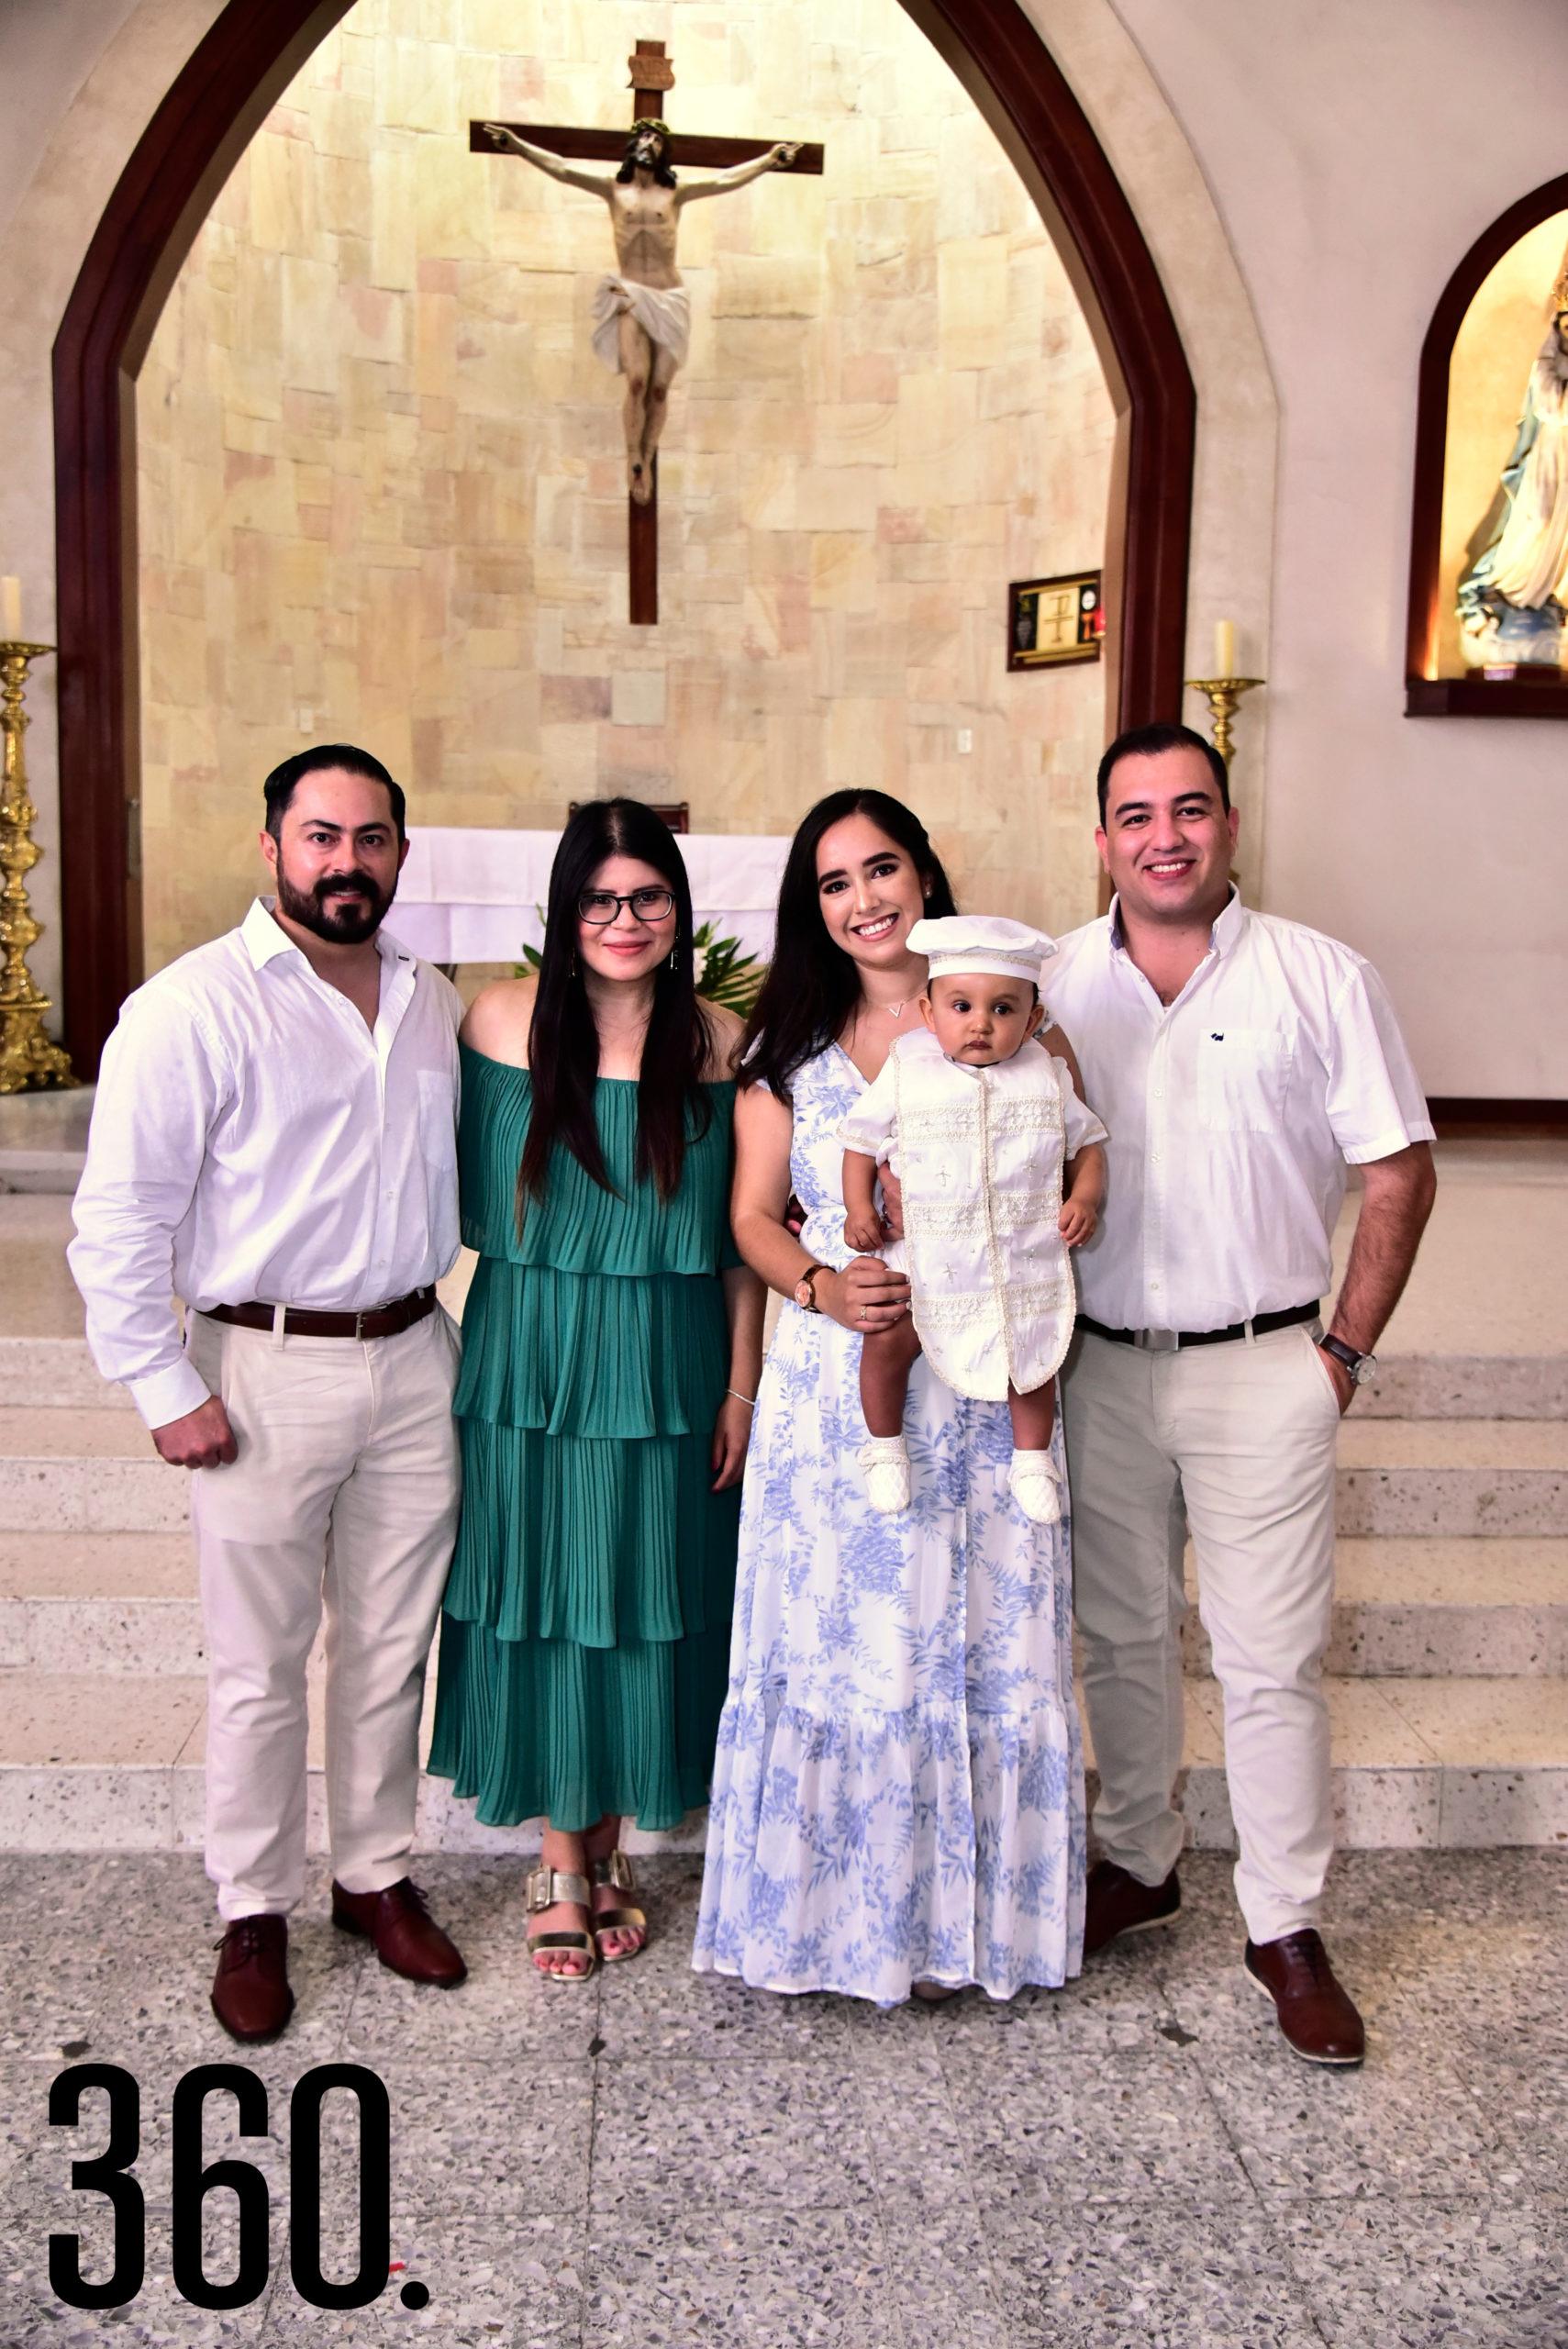 Armando Barragán Sousa en brazos de sus padrinos Arnoldo Barragán, Carmen Zul, Valeria Rodríguez y Jorge Barraza.